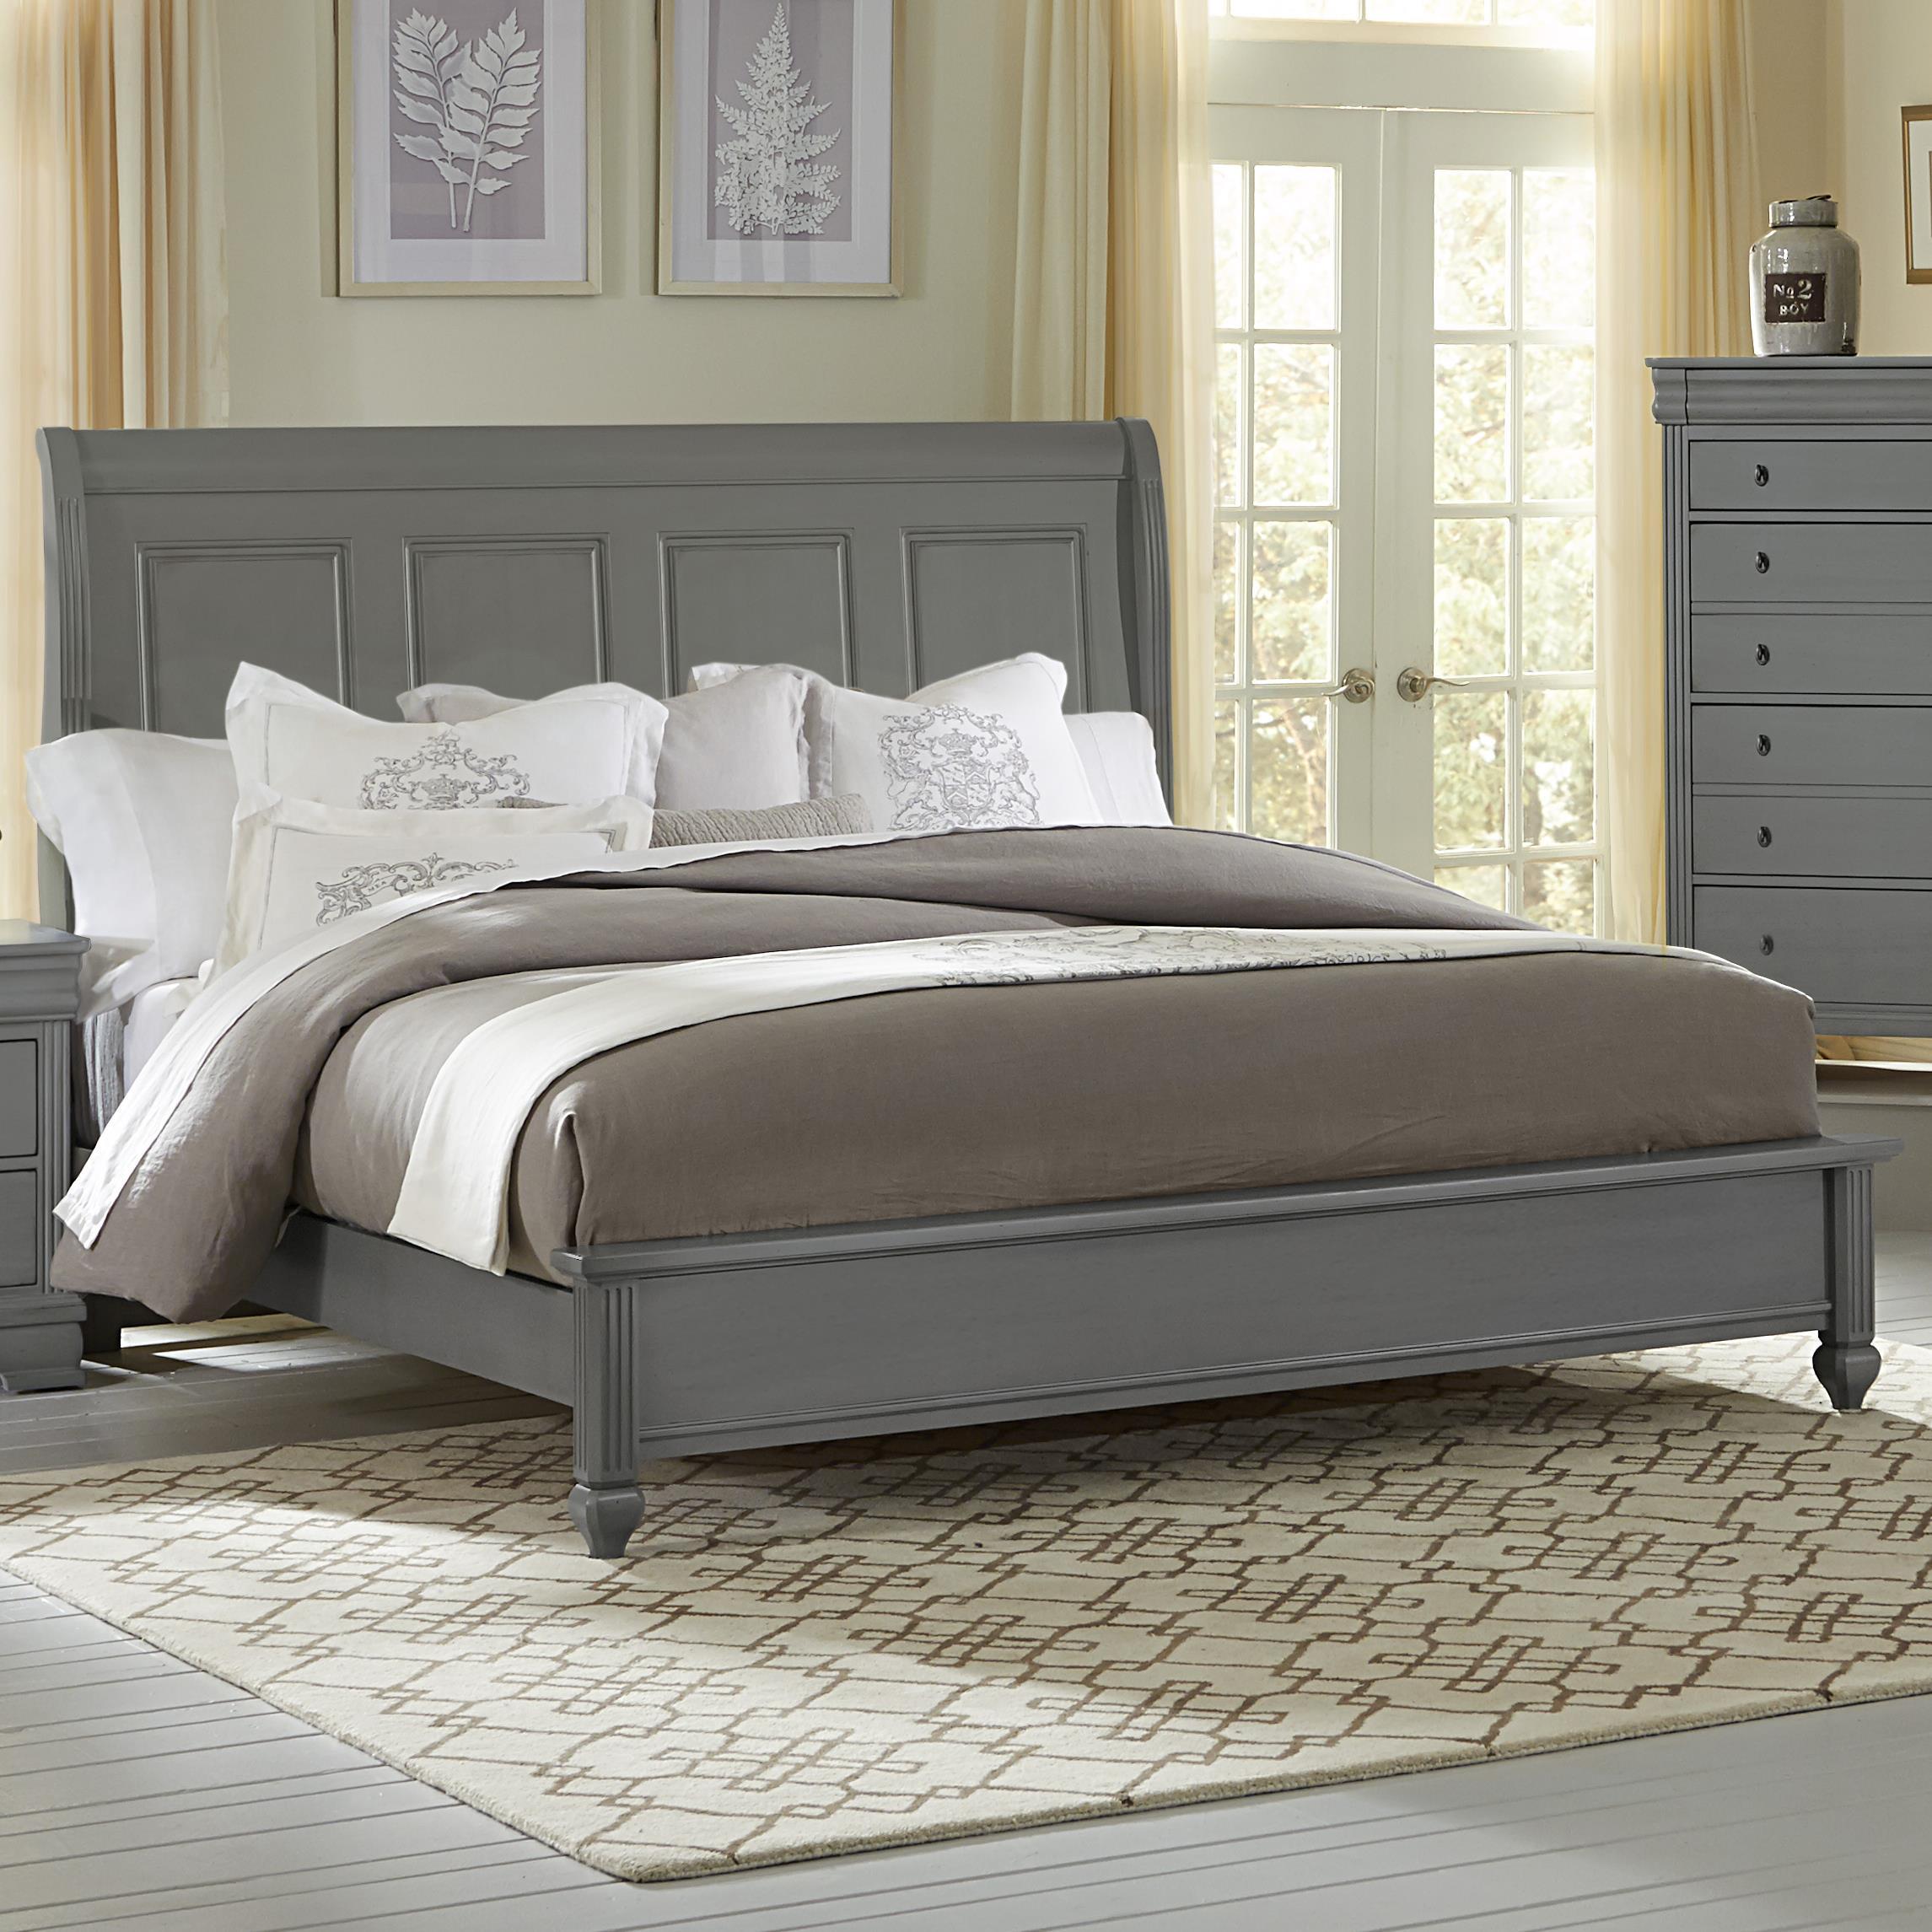 Vaughan Bassett French Market Queen Bed W Sleigh Headboard Low Profile Footboard Belfort